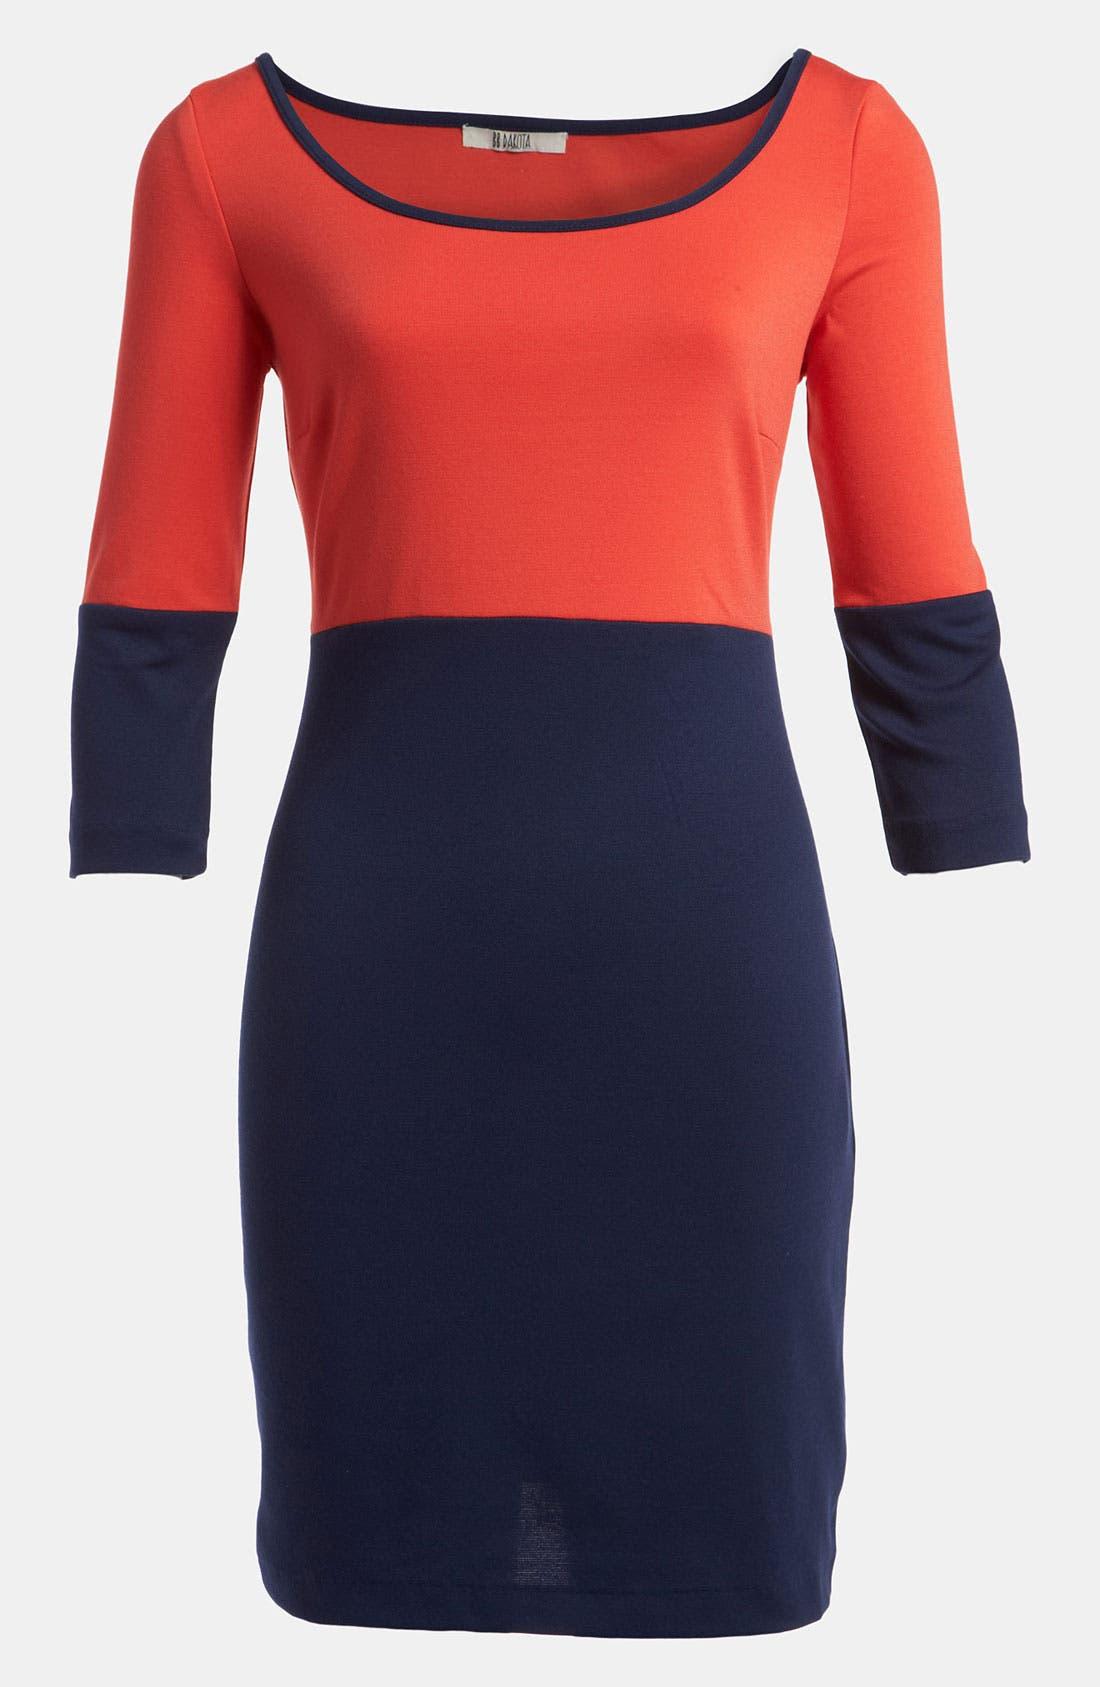 Alternate Image 1 Selected - BB Dakota Colorblock Knit Dress